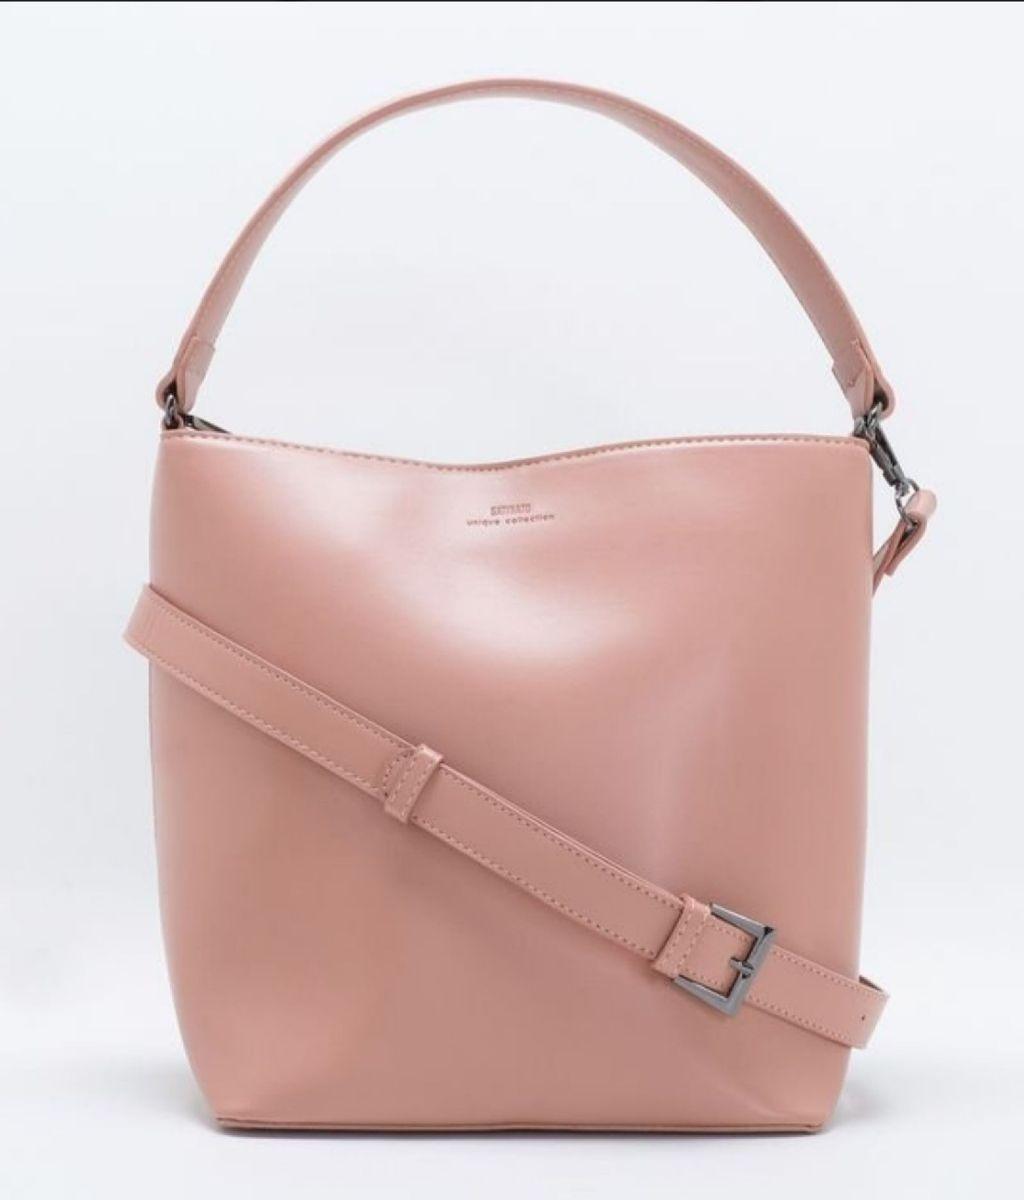 8fb5ea279 bolsa rosa renner - ombro satinato renner.  Czm6ly9wag90b3muzw5qb2vplmnvbs5ici9wcm9kdwn0cy83mzy4njkzlzgwn2fhndq4zjzjndblzti2yjawnmfhzdyxntjknwfmlmpwzw